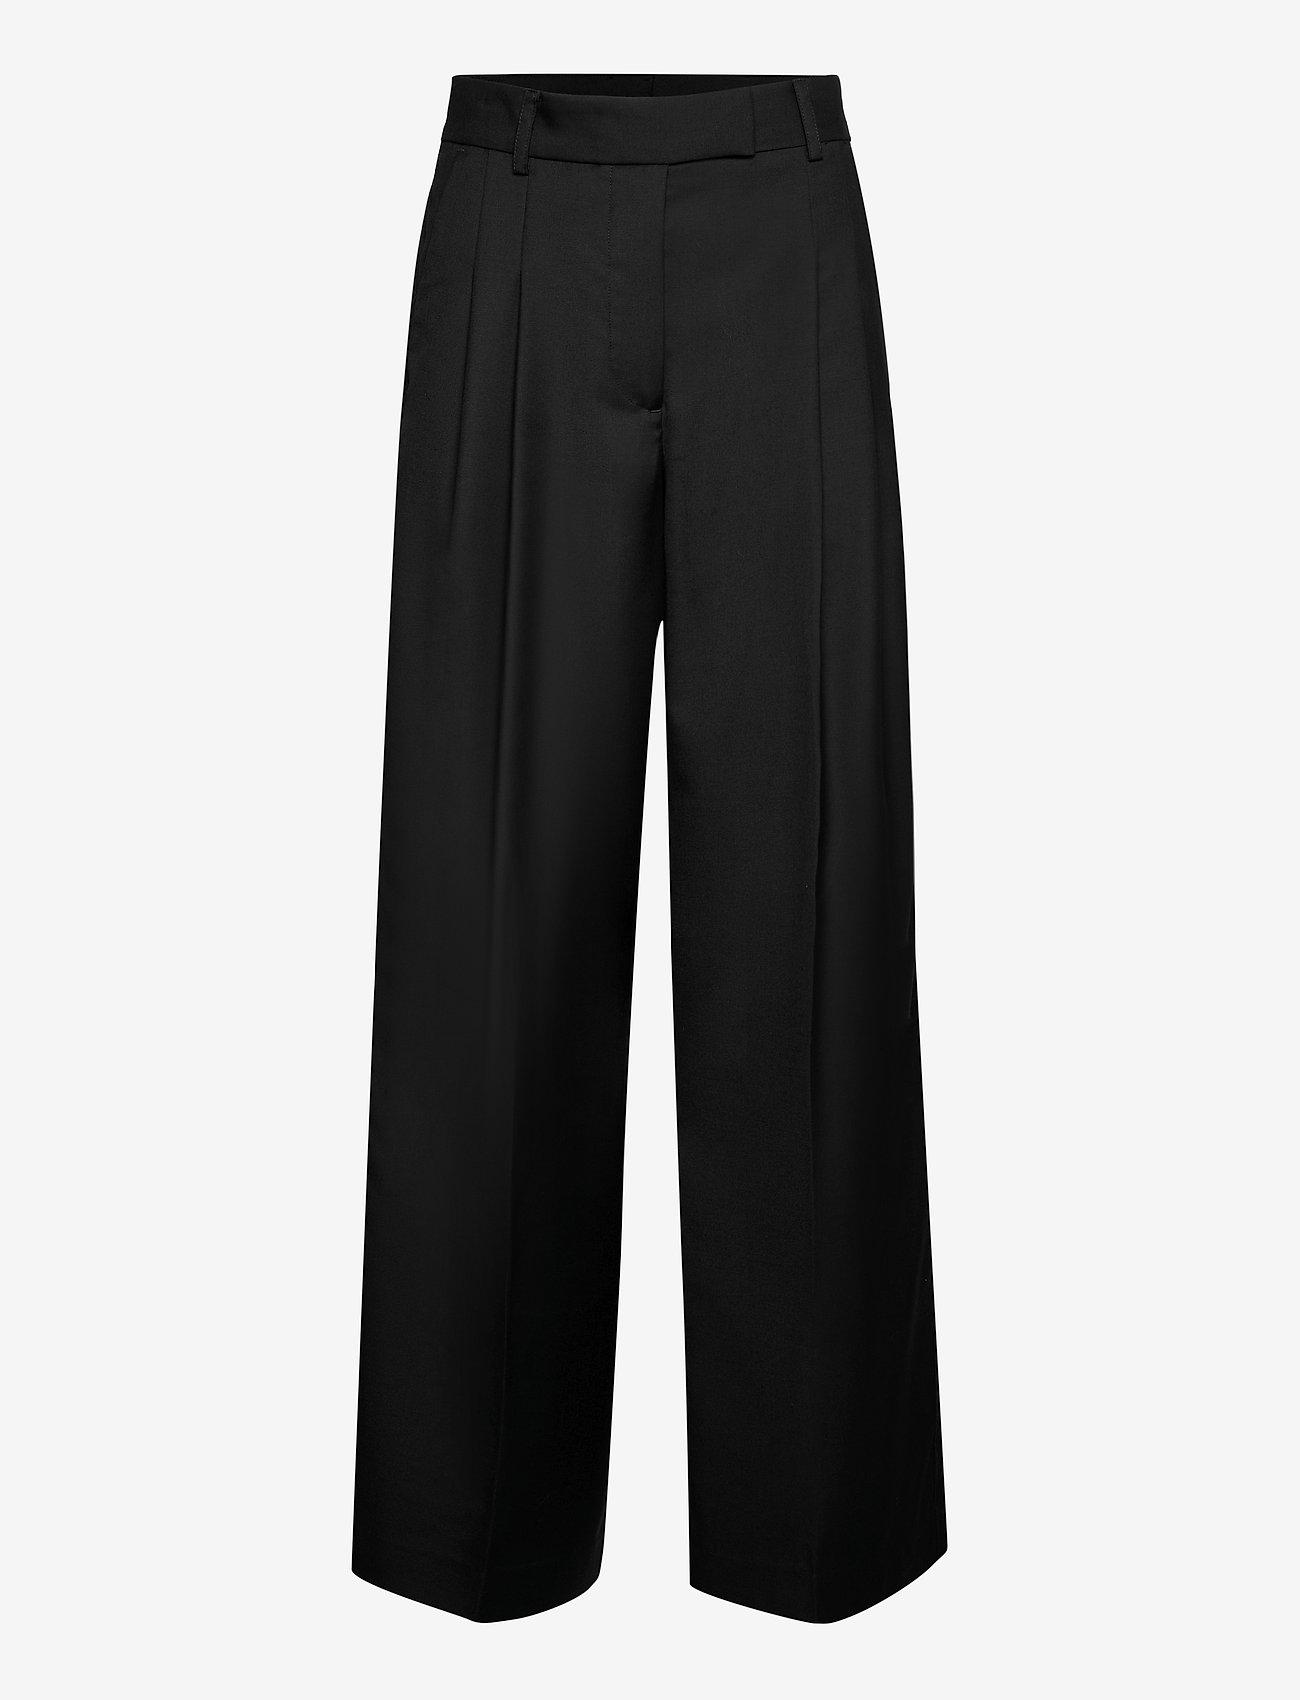 By Malene Birger - CYMBARIA - bukser med brede ben - black - 0